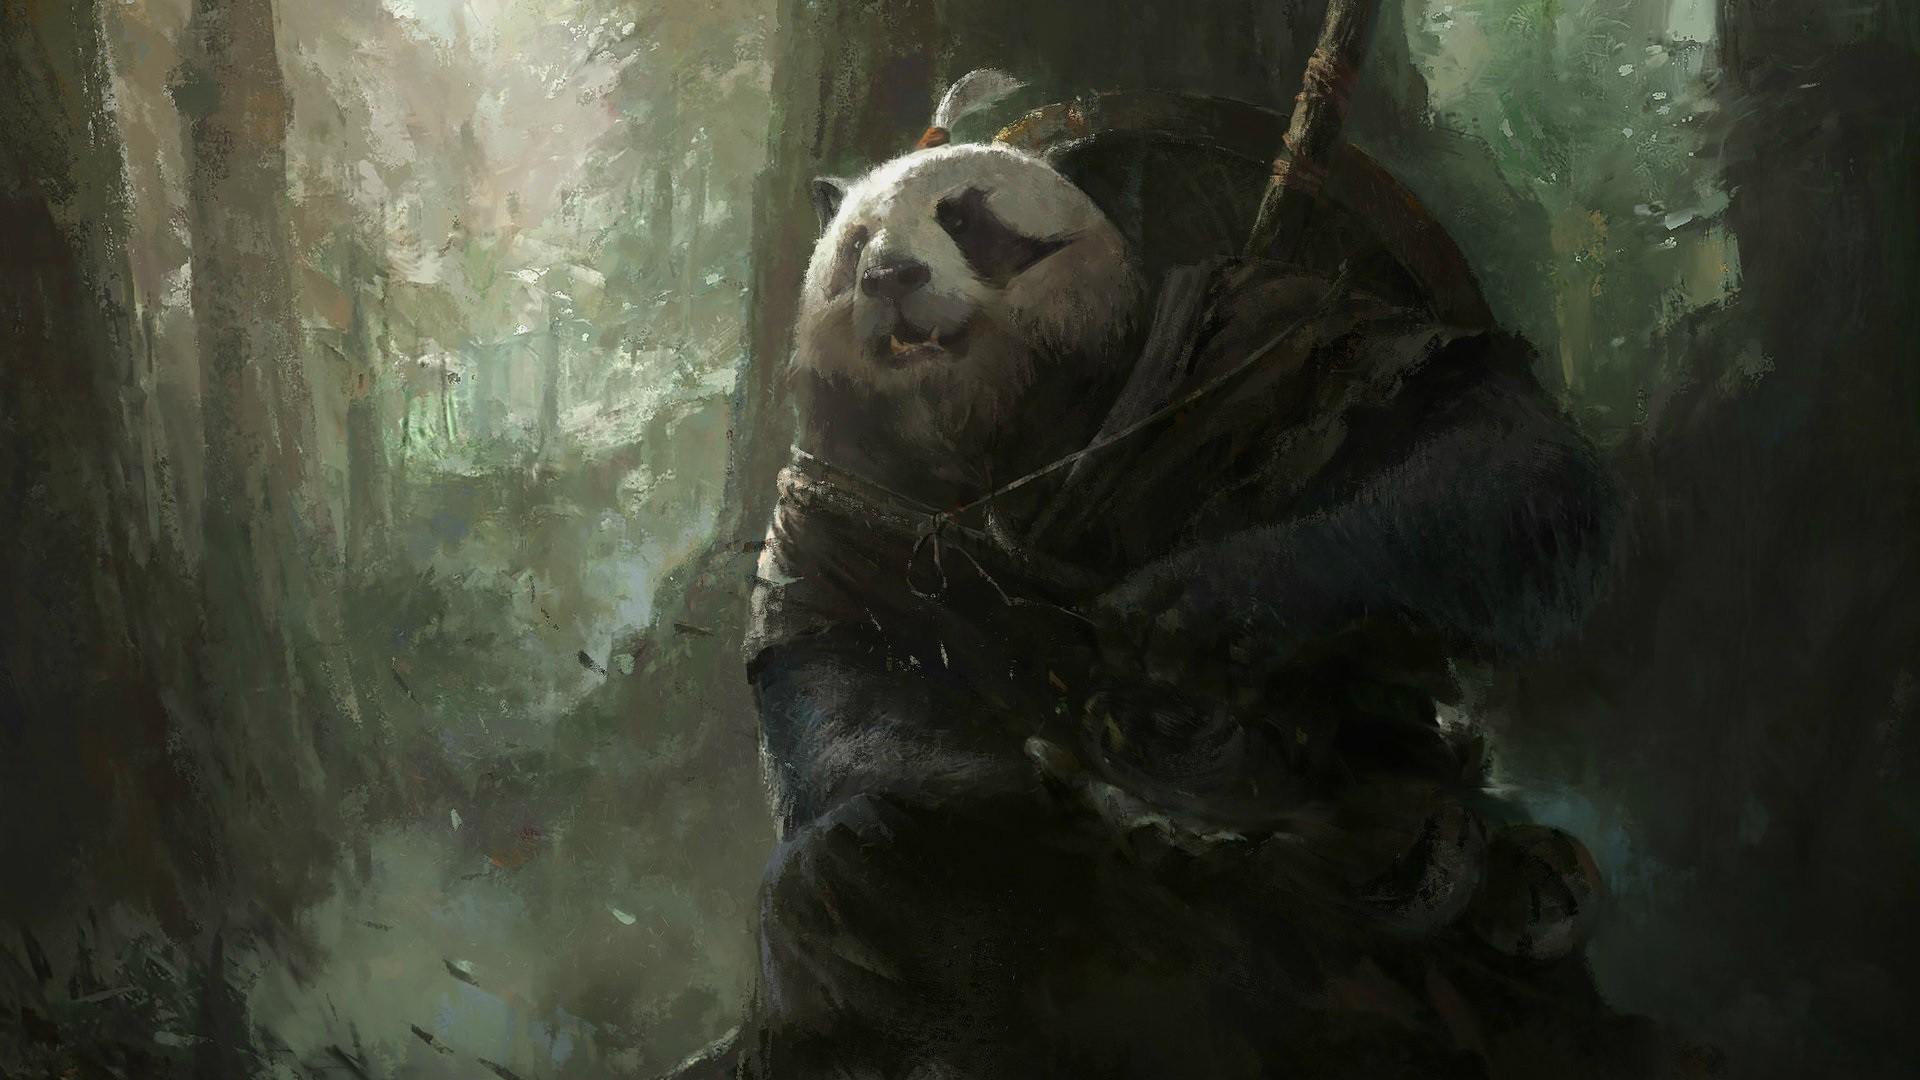 1920x1080 Px Fantasy Art Magic Mazert Young Panda World Of Warcraft Mists Pandaria